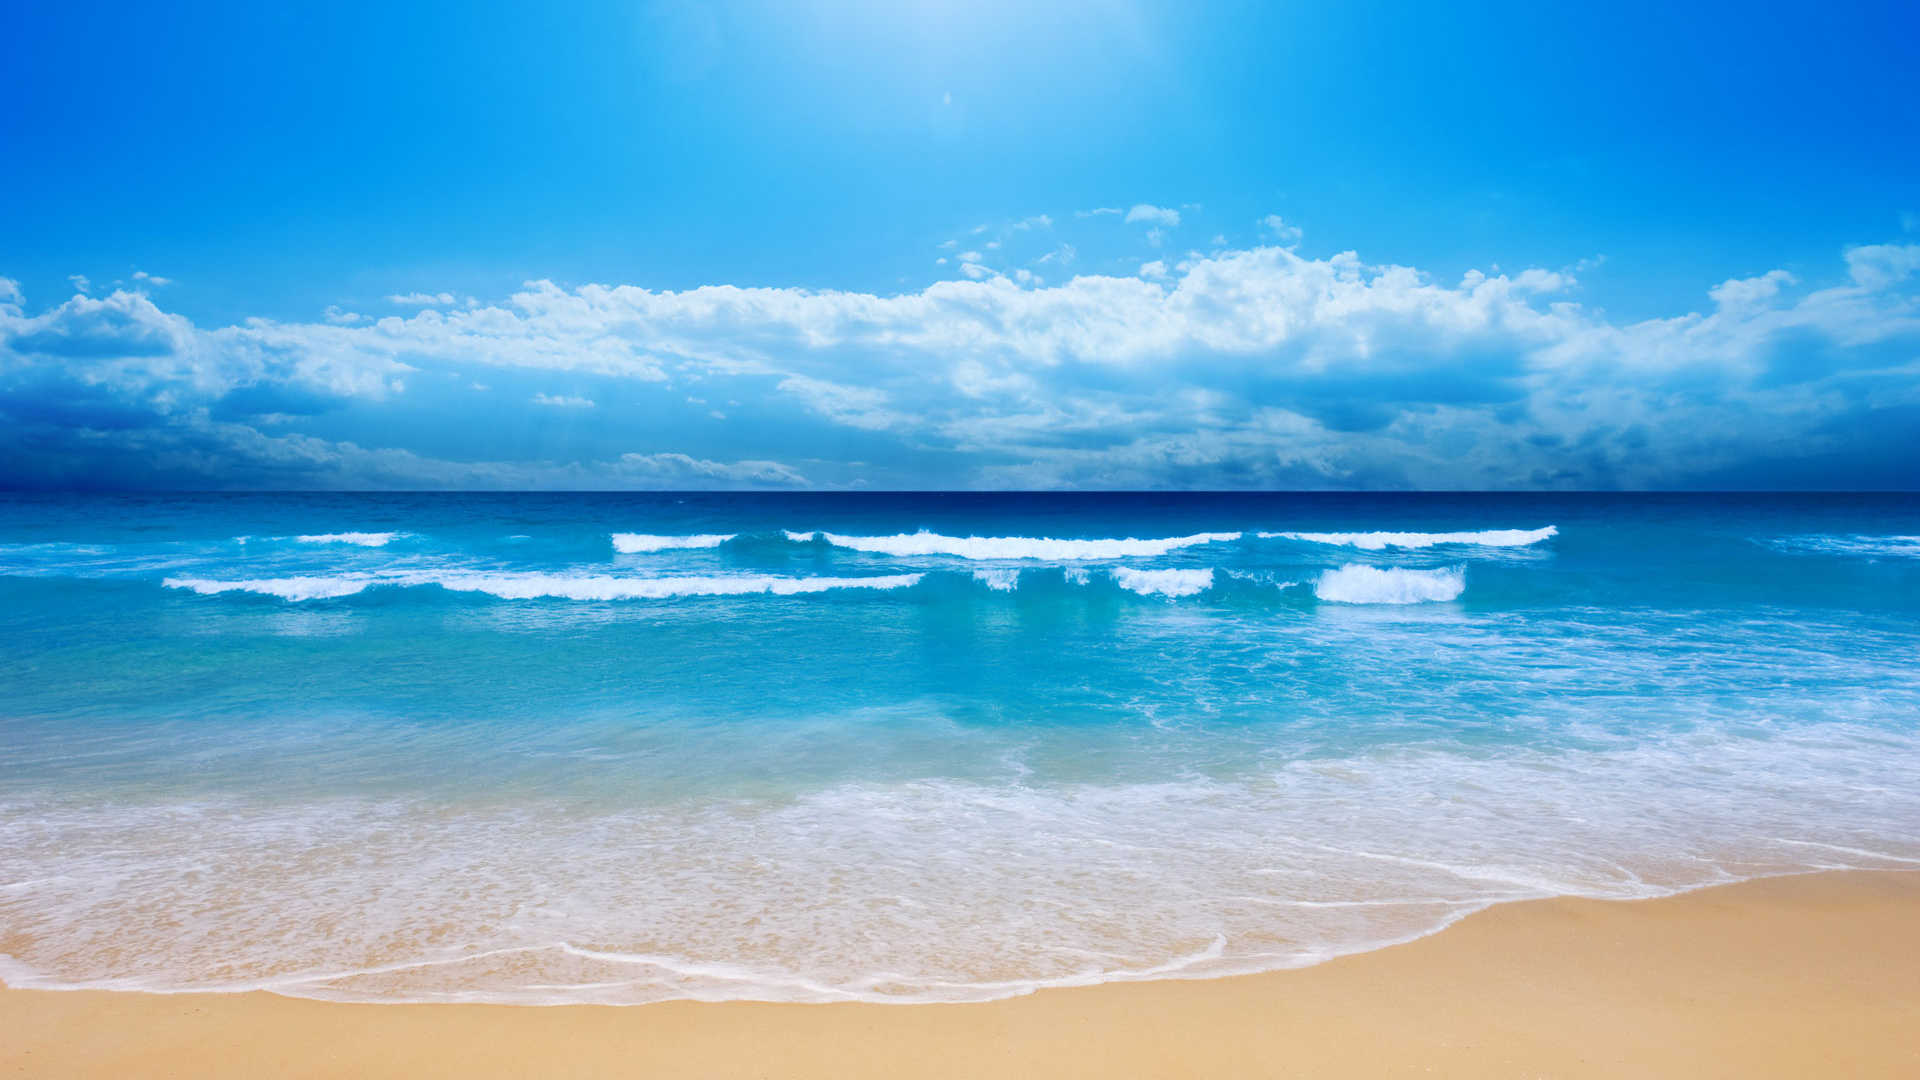 small_sea_wave_hdtv_1080p-HD.jpg